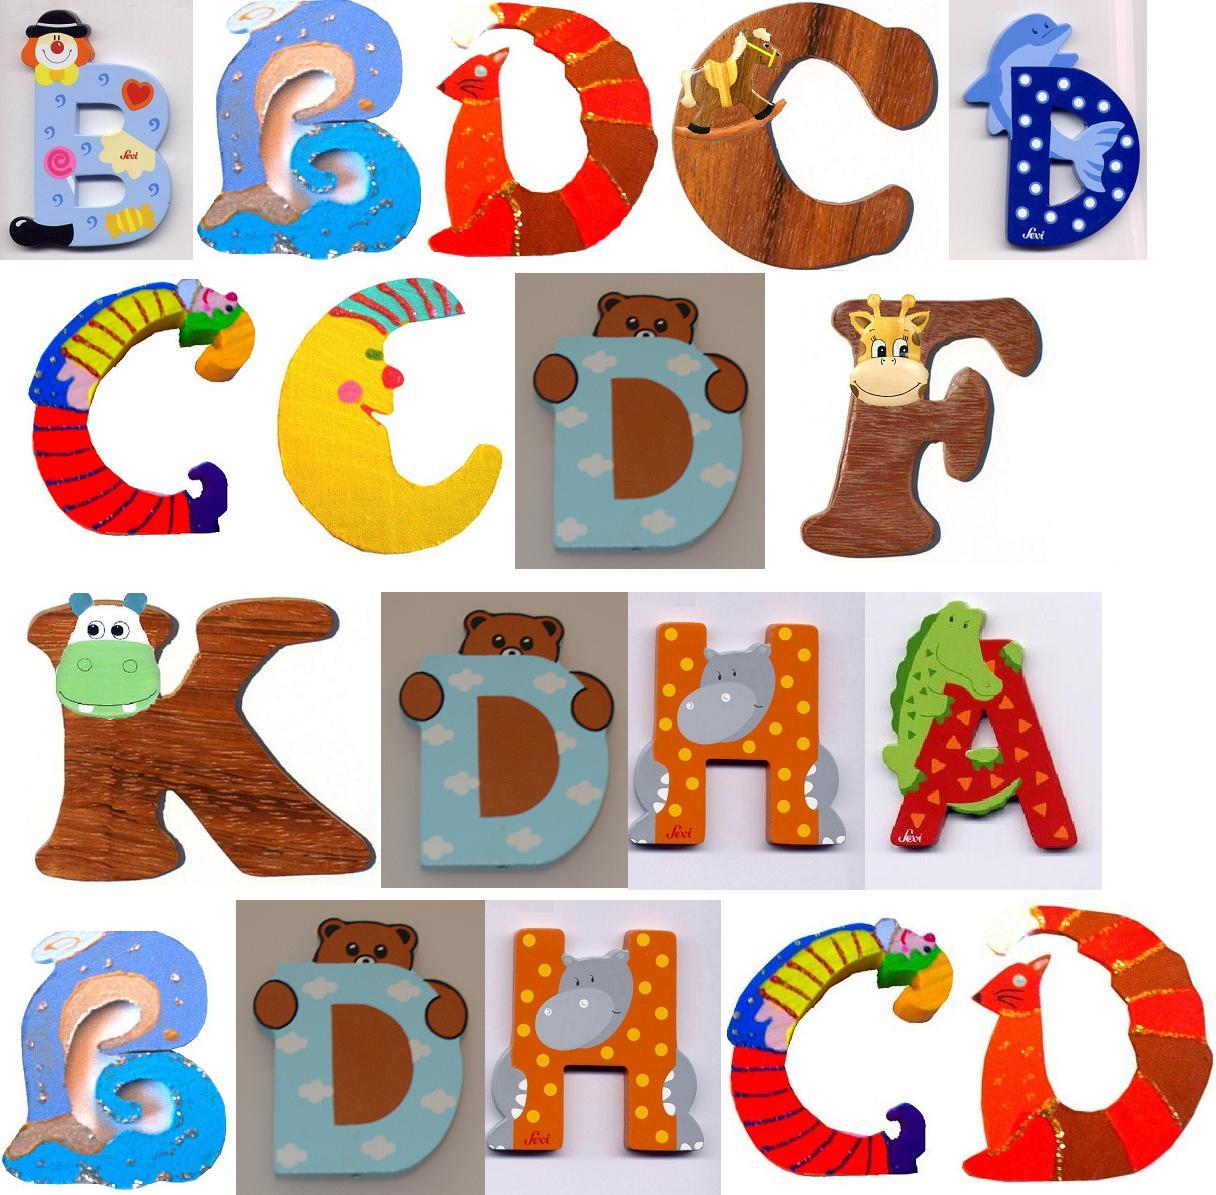 http://www.prise2tete.fr/upload/Flying_pyros-barrage.jpg